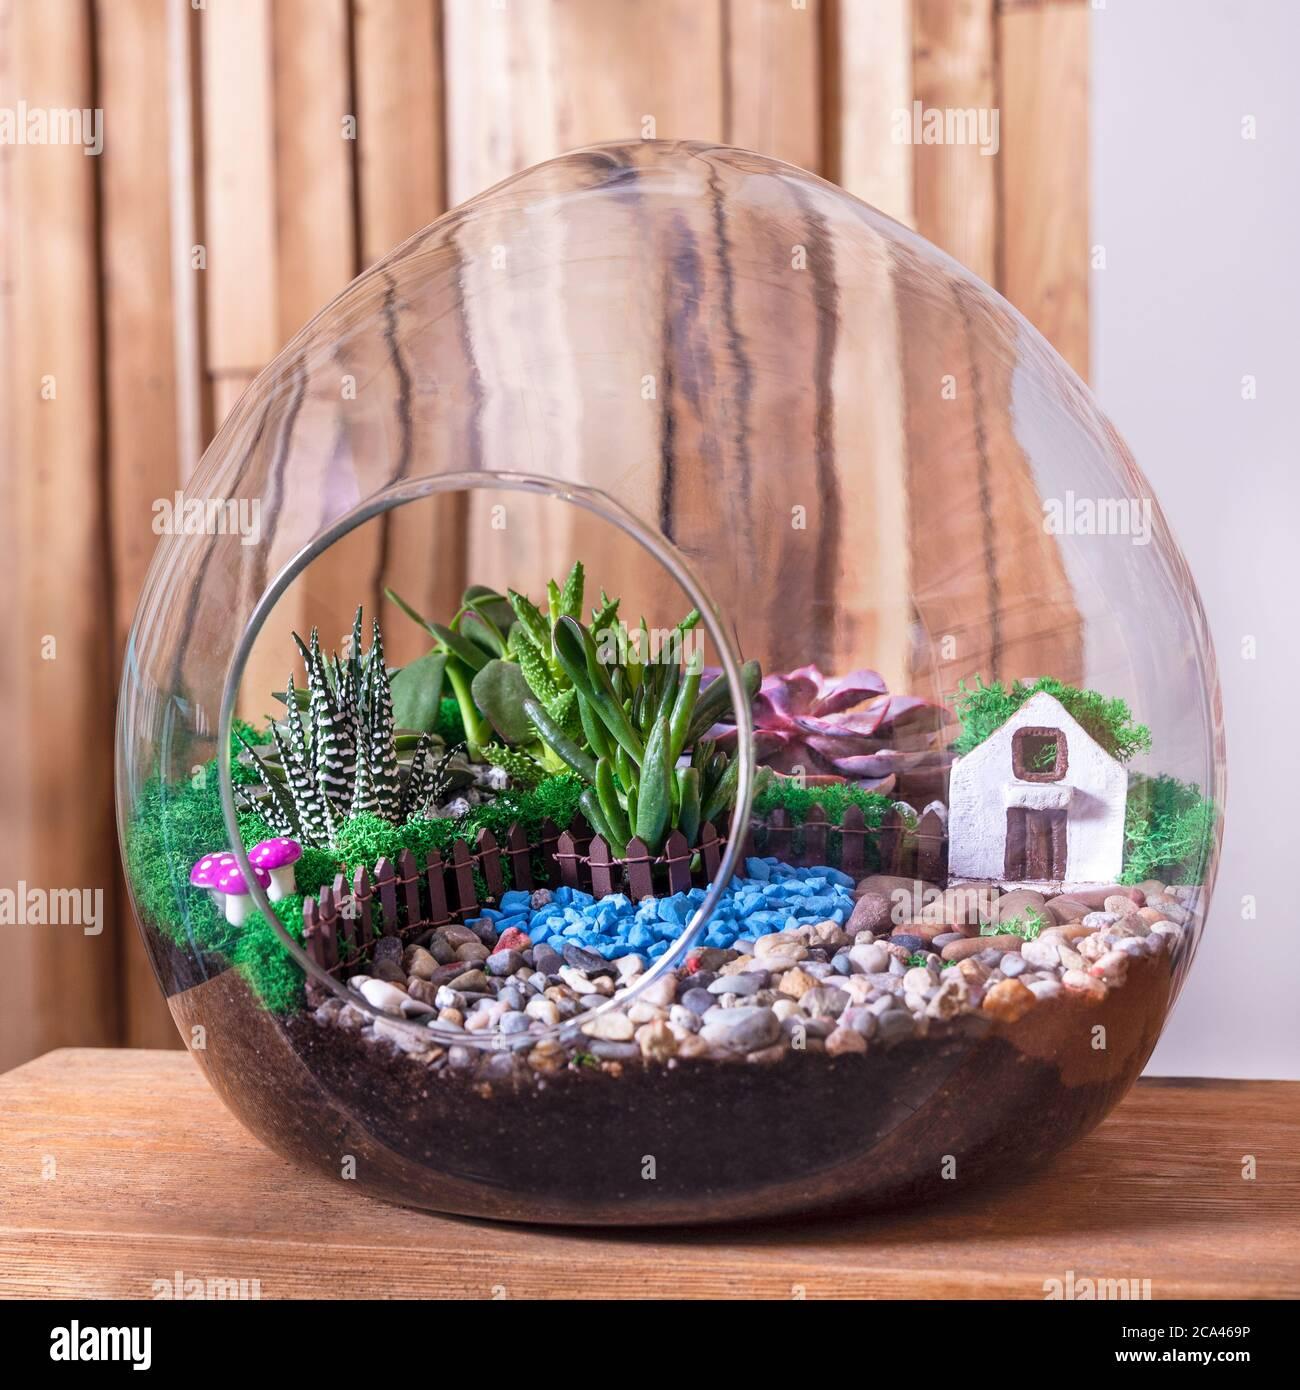 Terrarium Sand Rock Succulent Cactus Decor Small House In The Glass Stock Photo Alamy